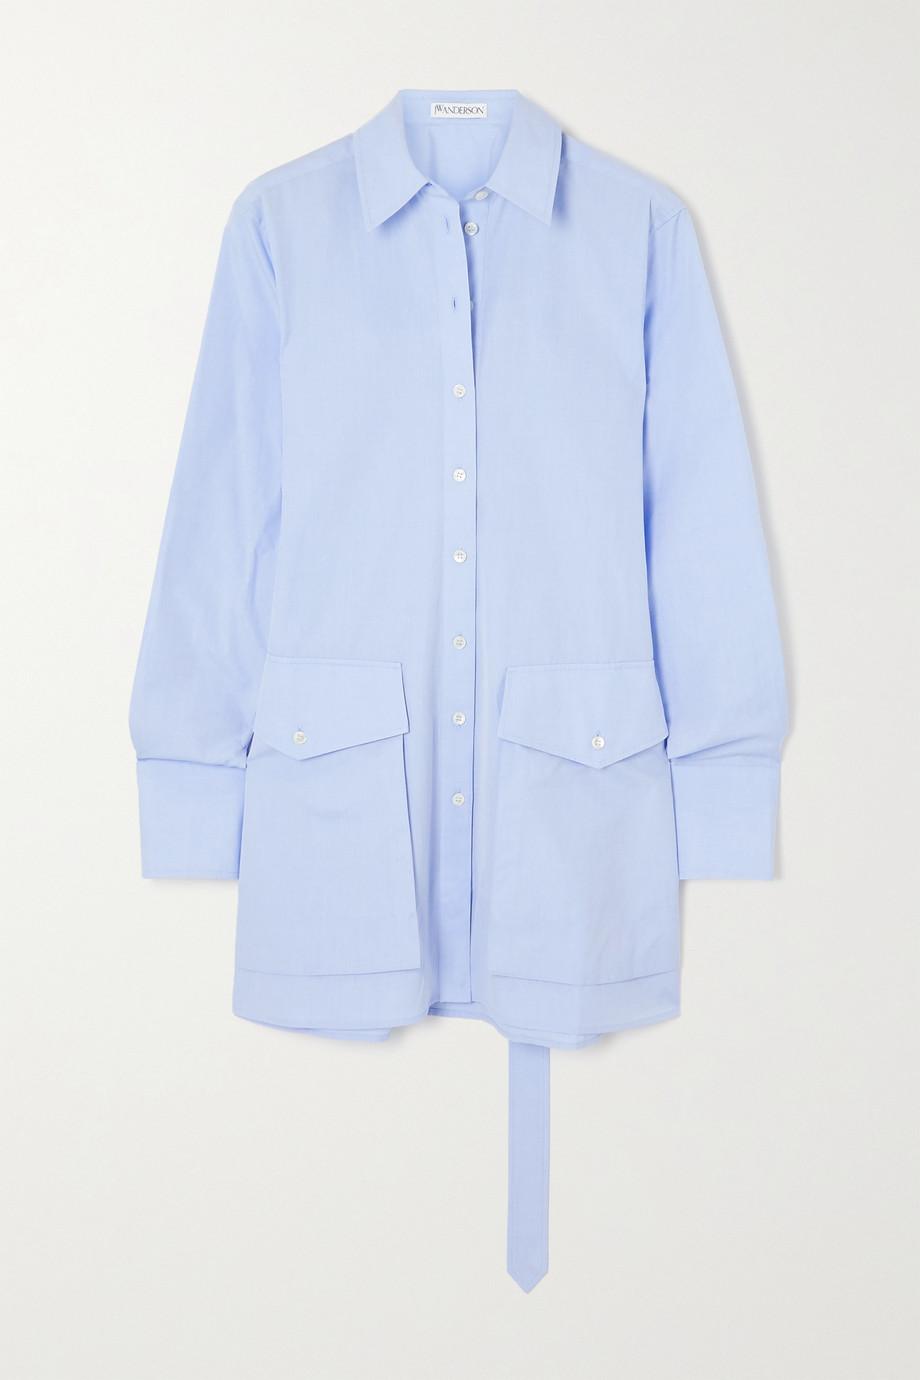 JW Anderson Cotton-poplin tunic